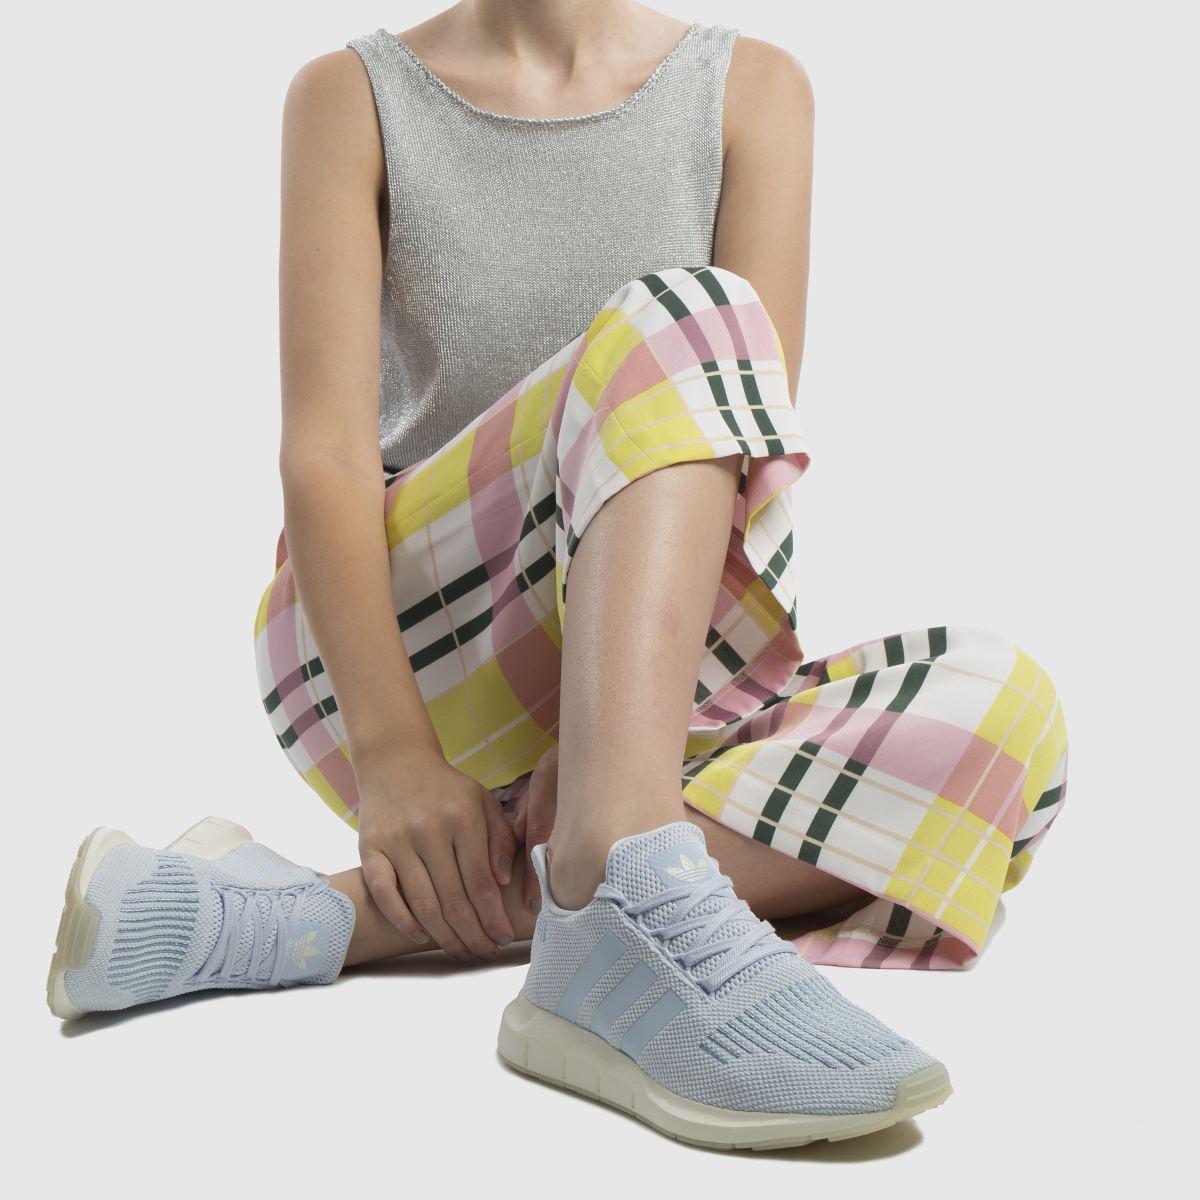 Damen Hellblau adidas Swift Run Sneaker   schuh Gute Qualität beliebte Schuhe